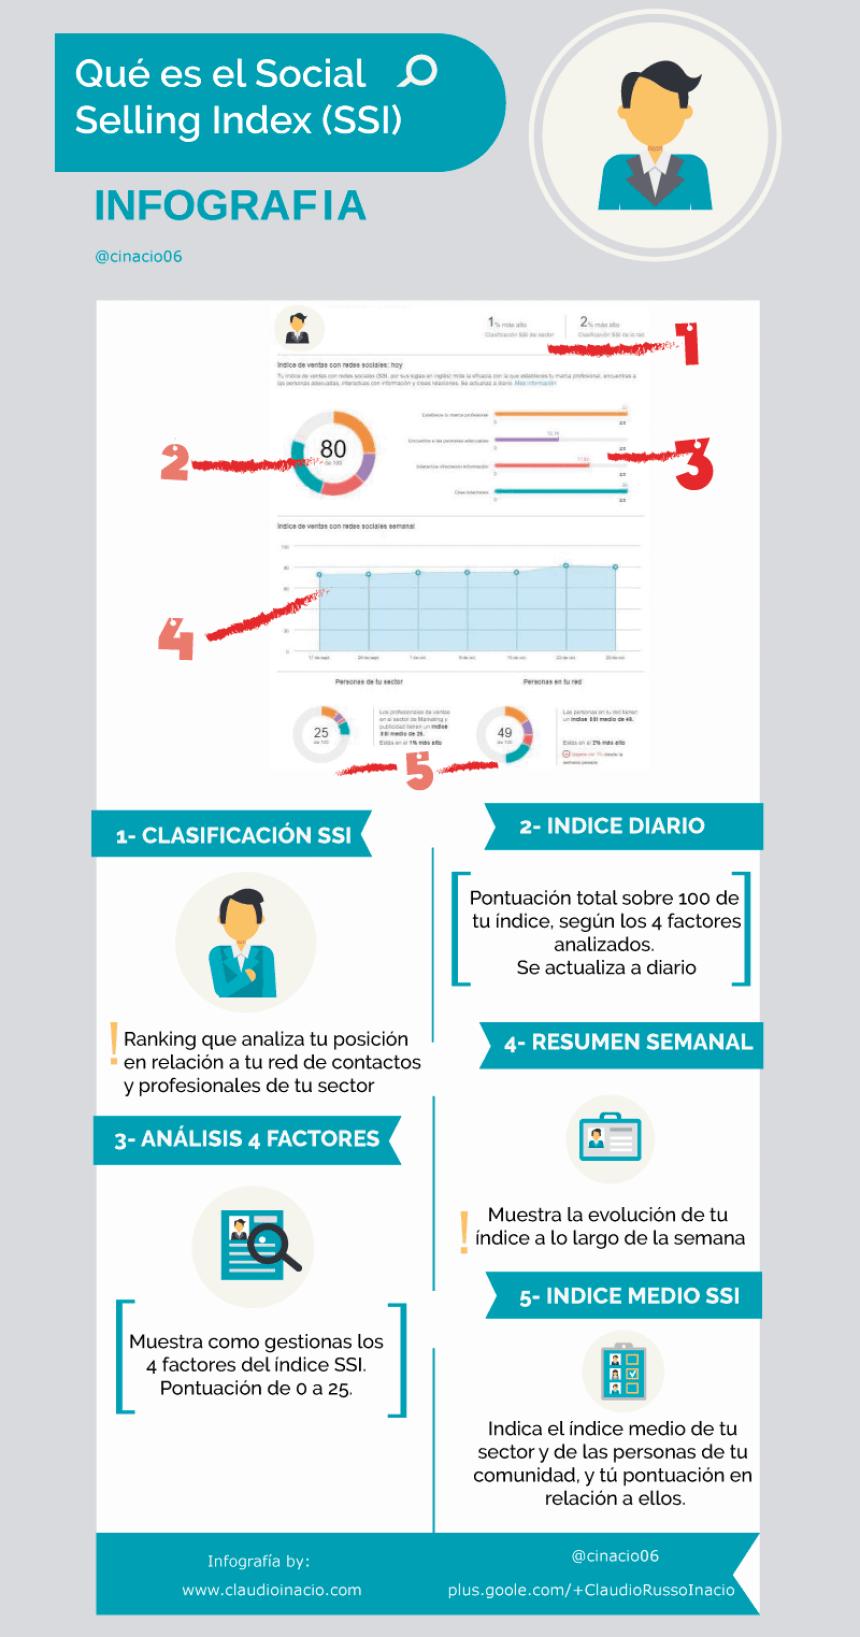 Qué es el Social Selling Index (SSI)